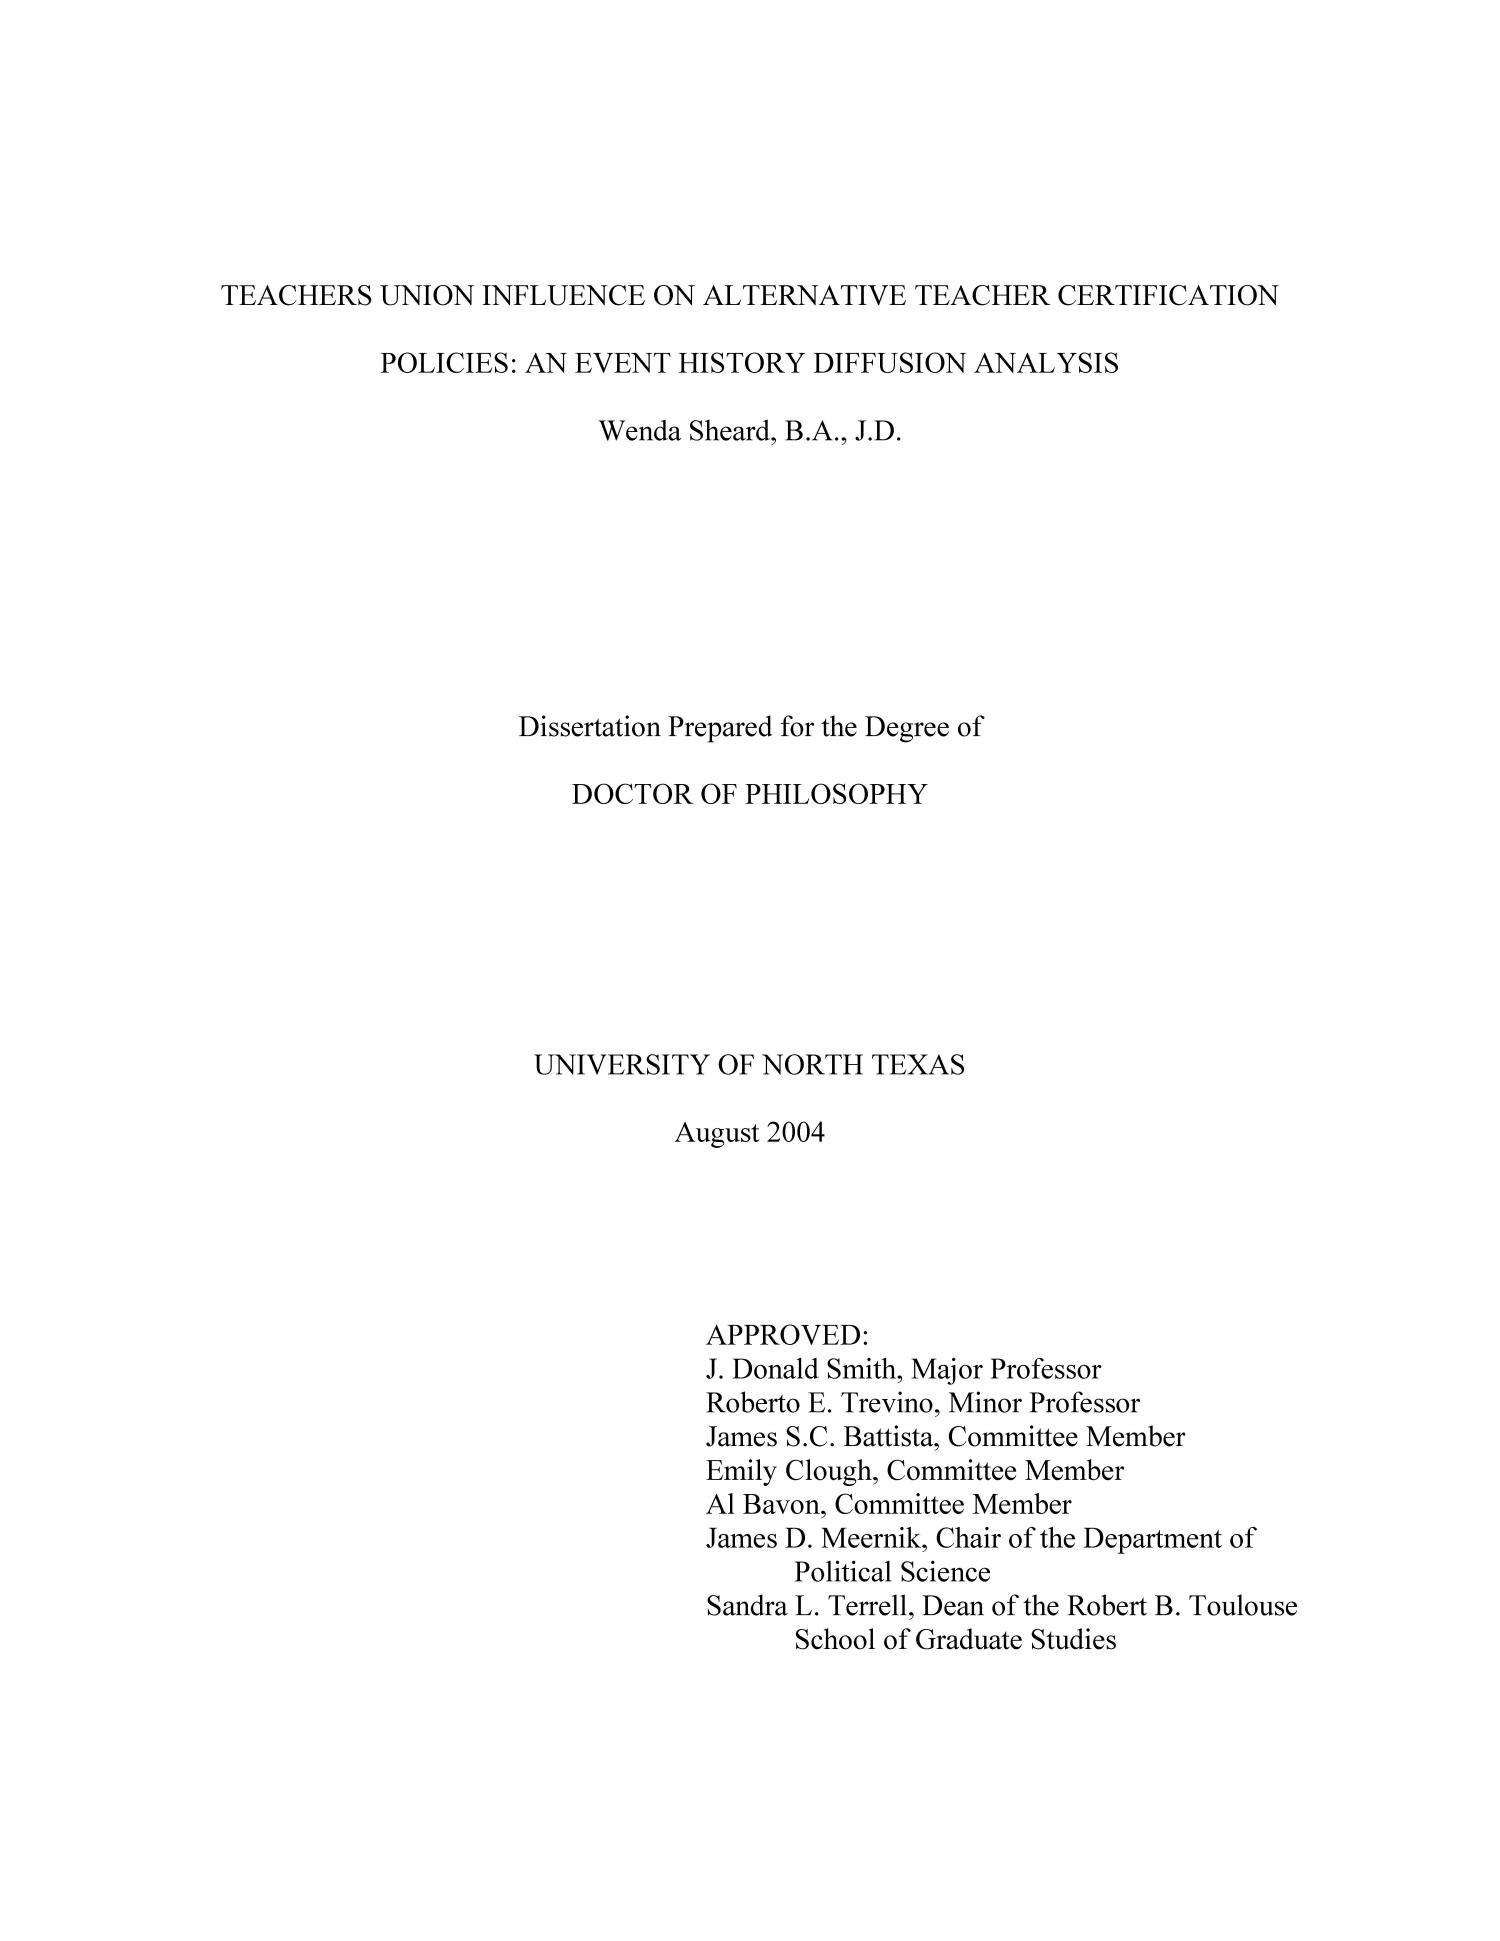 Dissertation of alternative diploma programs